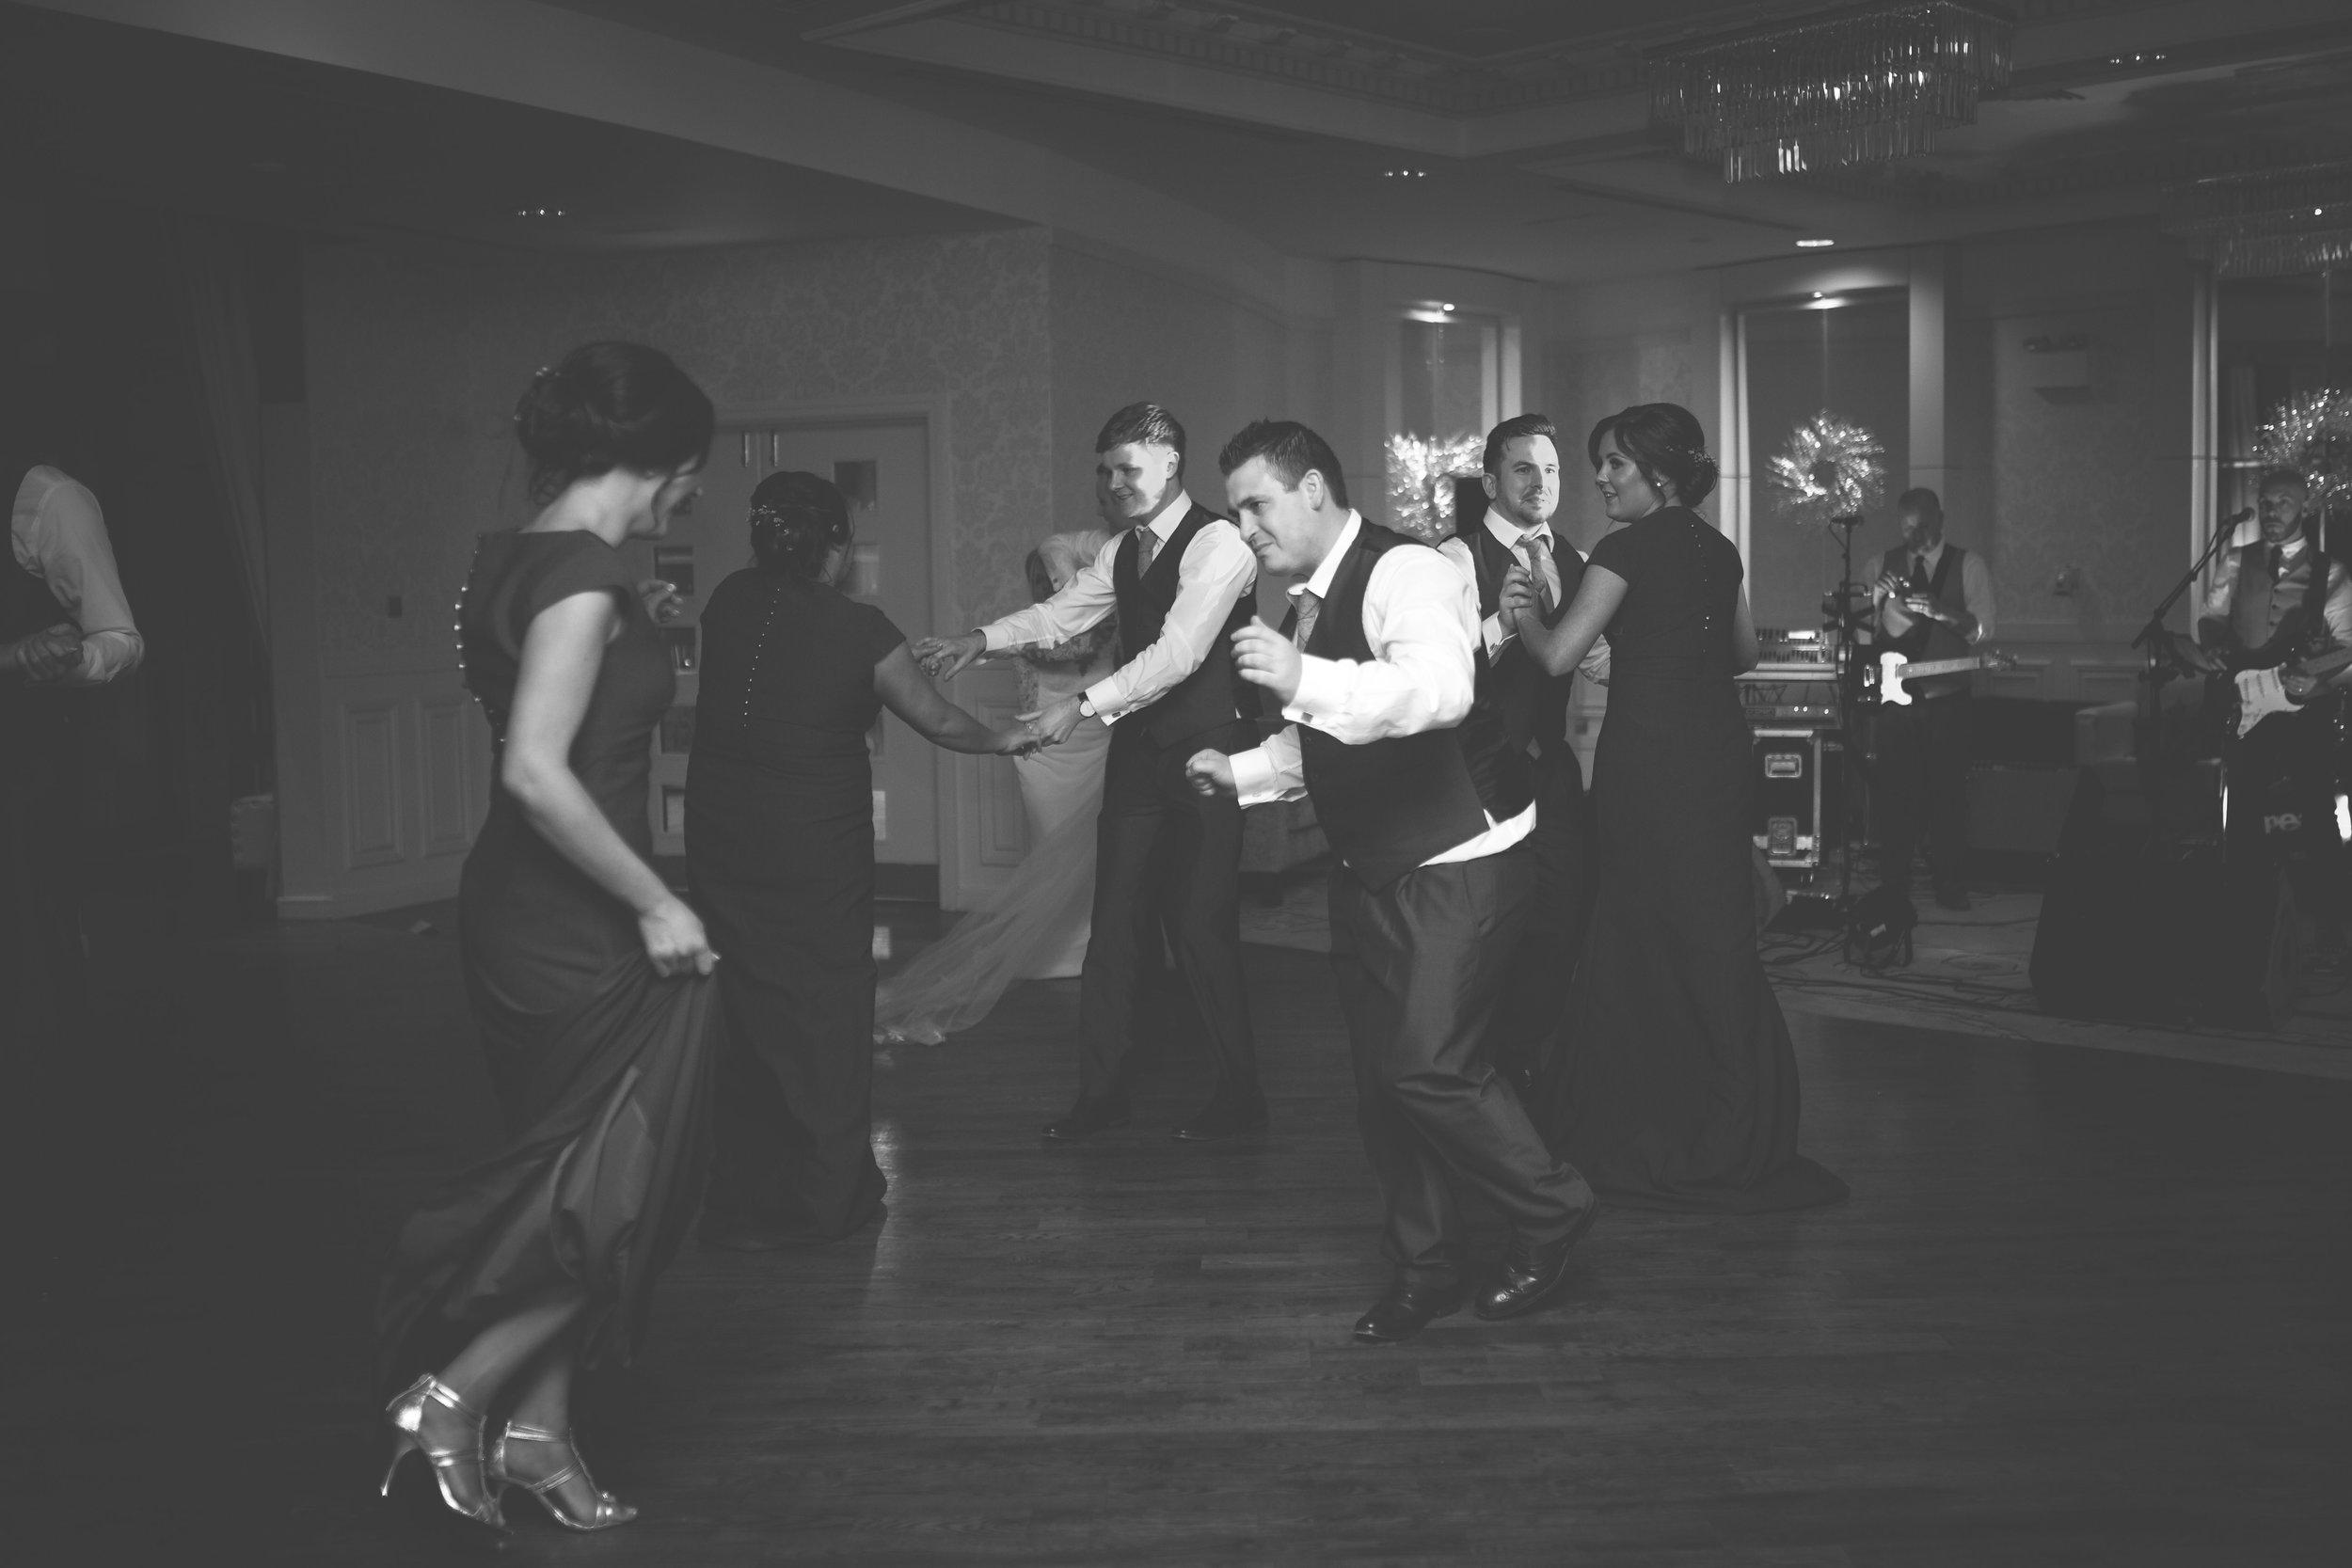 MaryJo_Conor_Mageean_Dancing-5.jpg